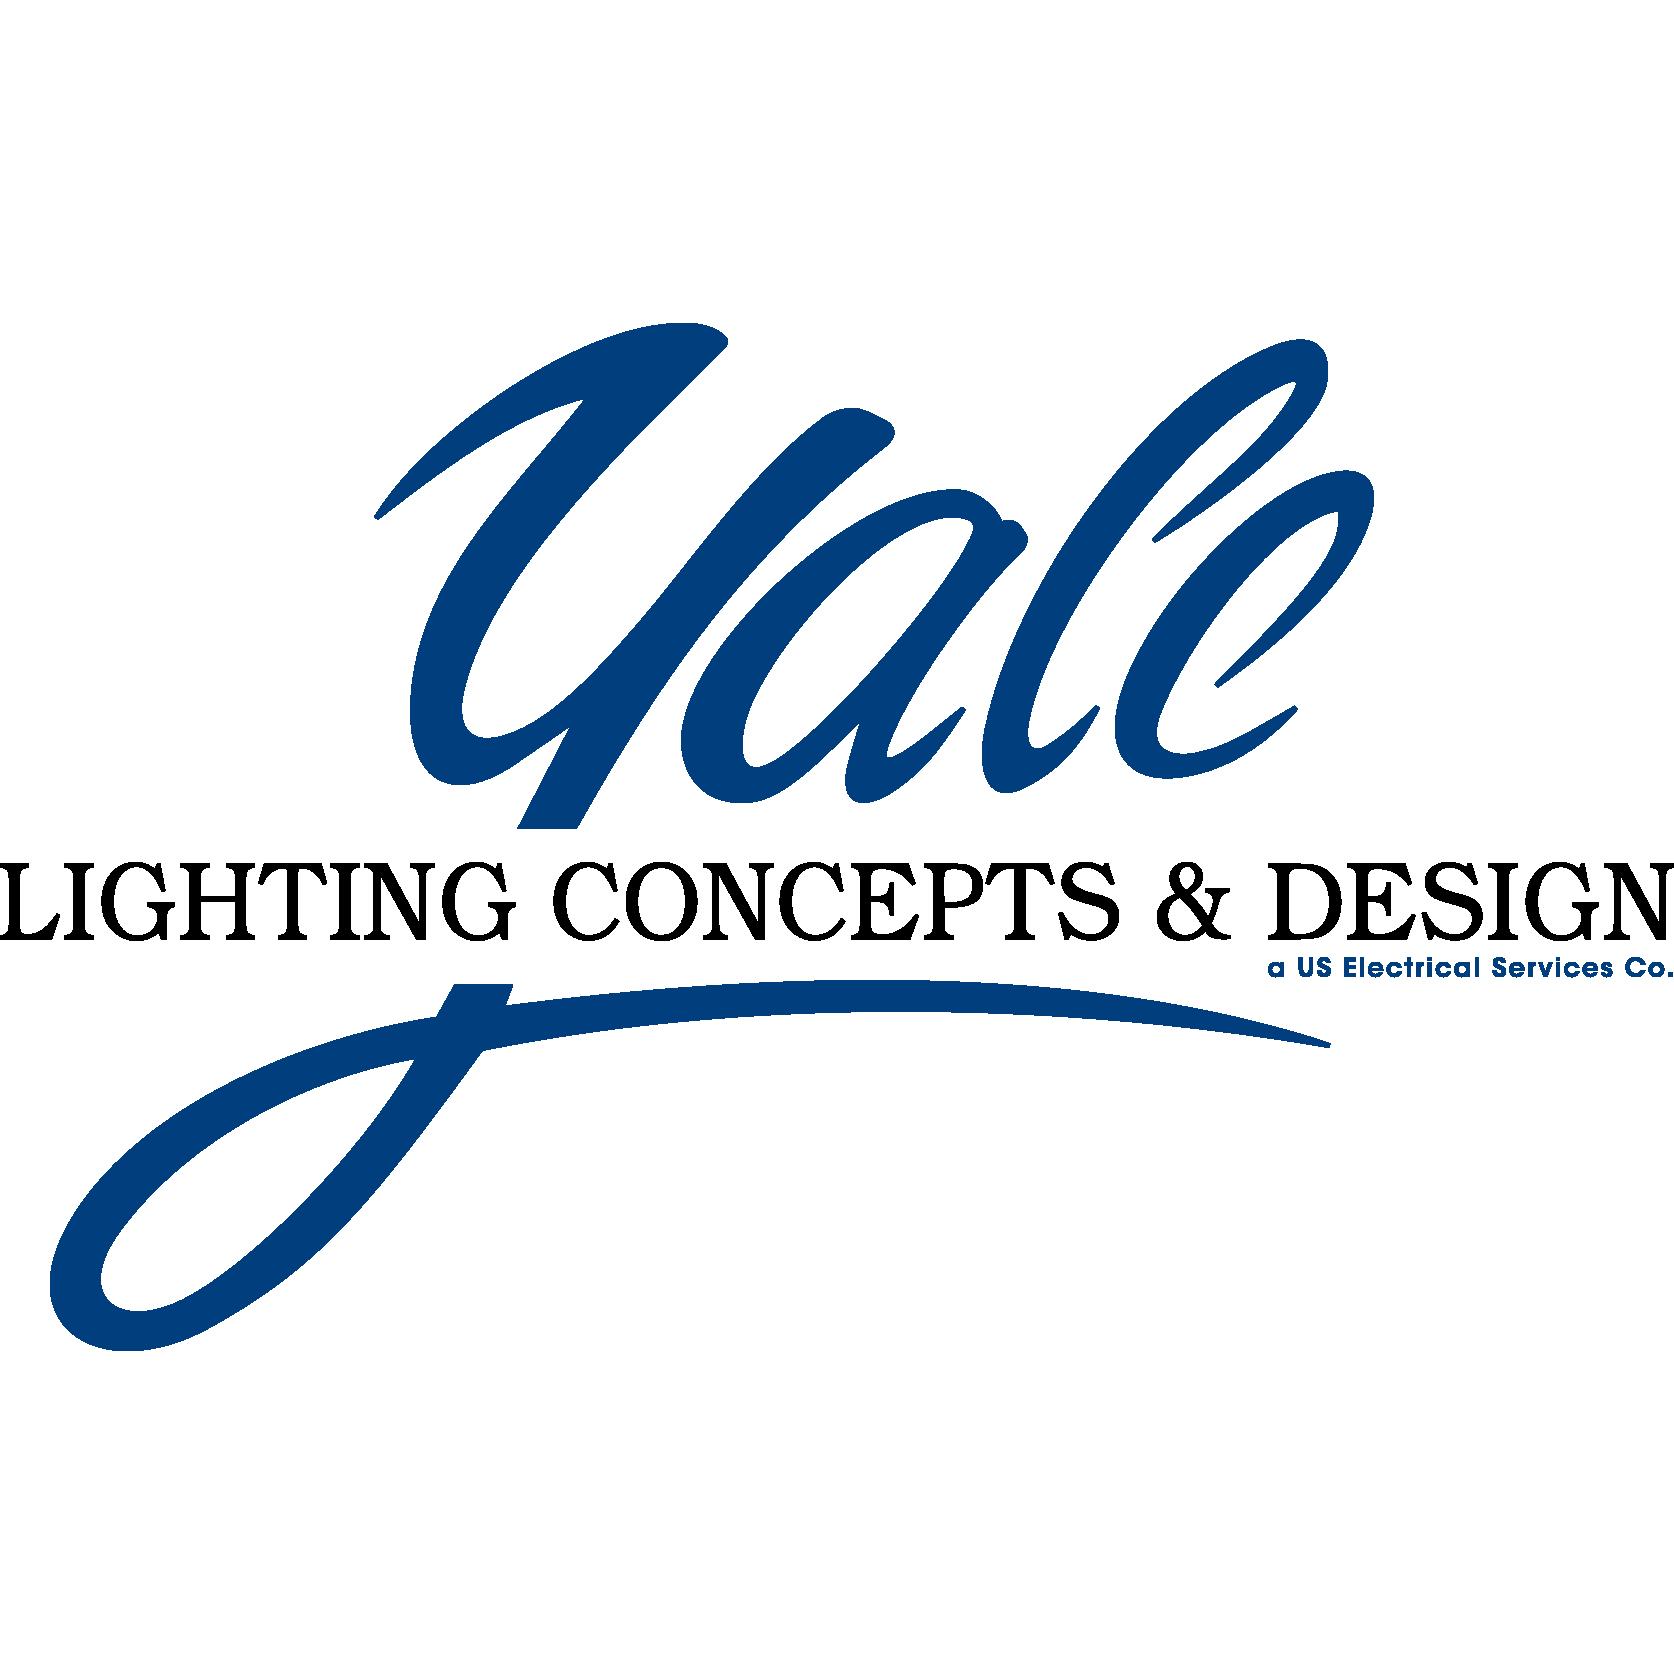 Yale Lighting Concepts & Design